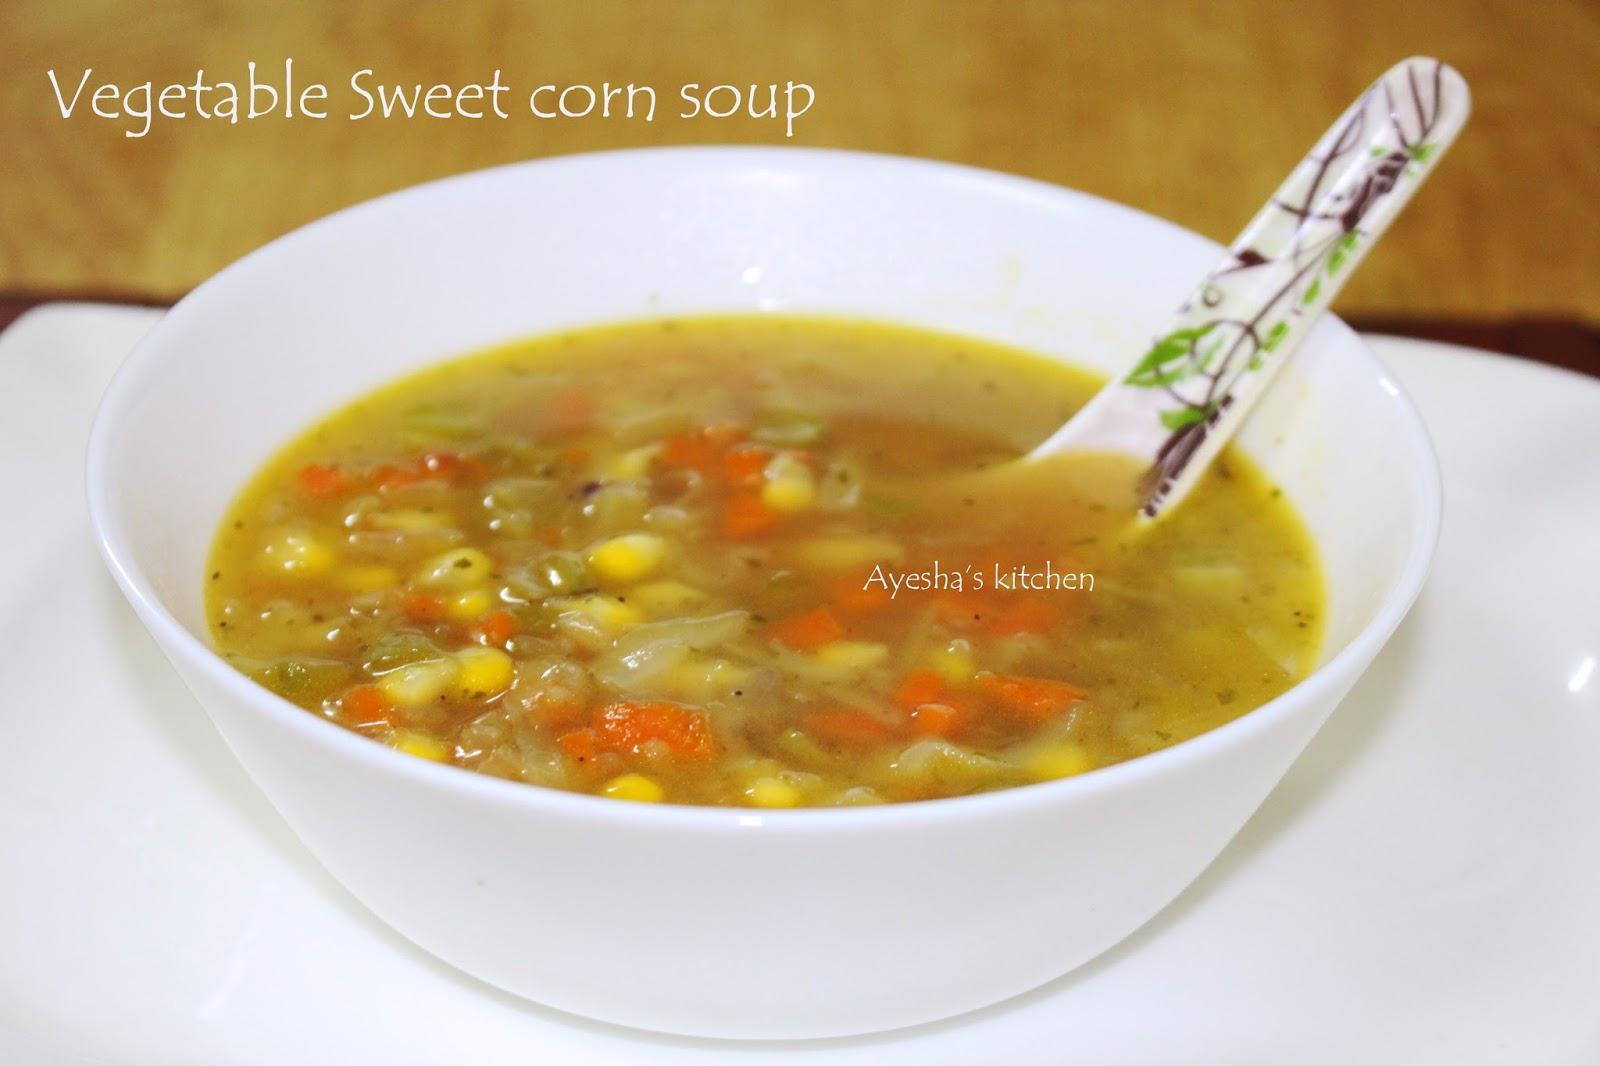 Vegetable sweet corn soup recipe sweet corn veg soup for Easy tasty soup recipes